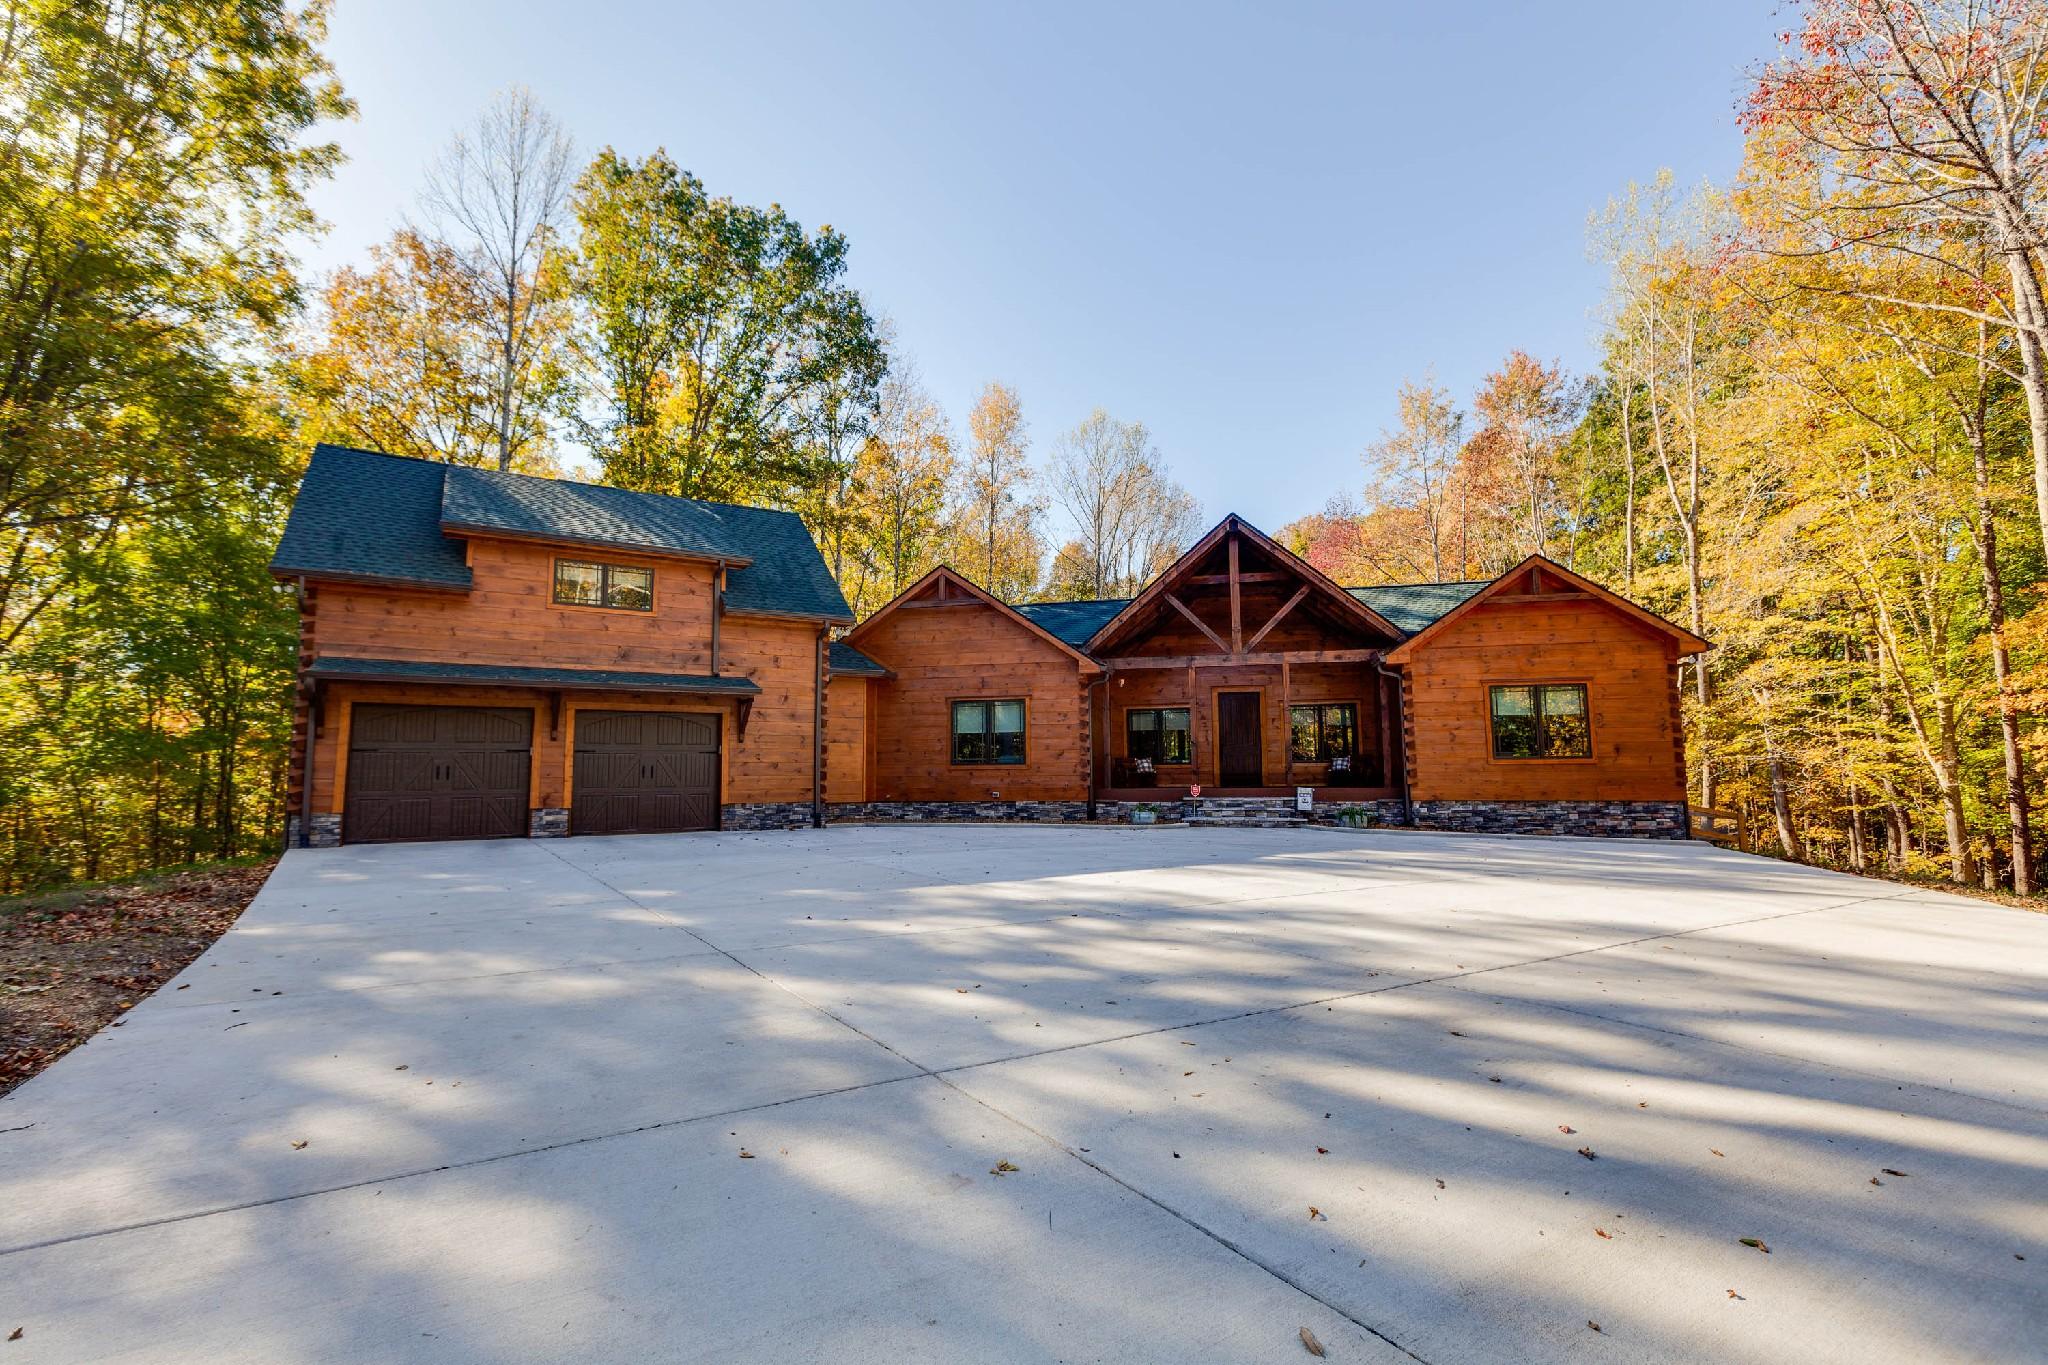 562 Ridgeview Dr, Pegram, TN 37143 - Pegram, TN real estate listing